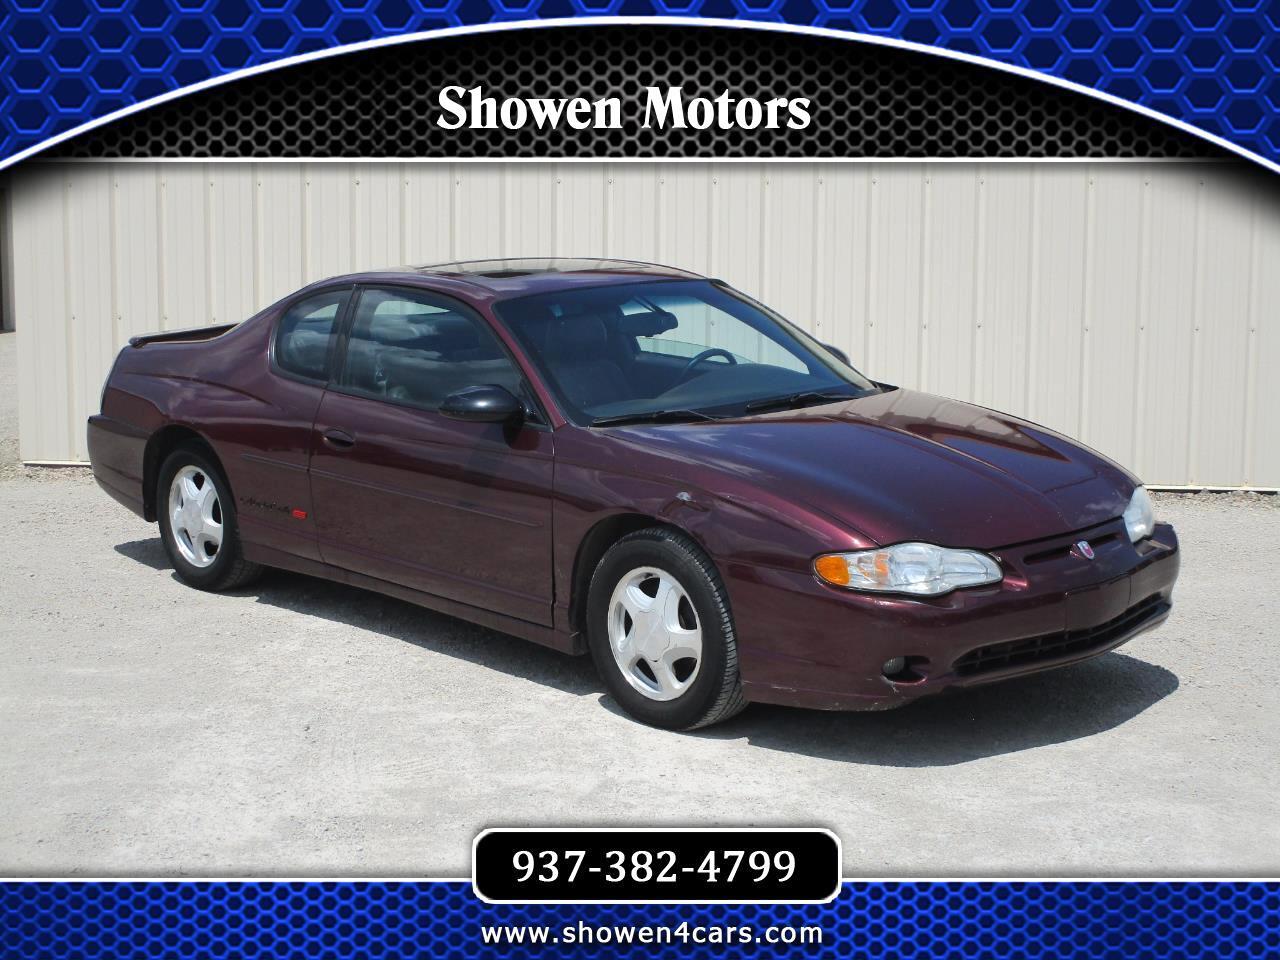 2003 Chevrolet Monte Carlo SS